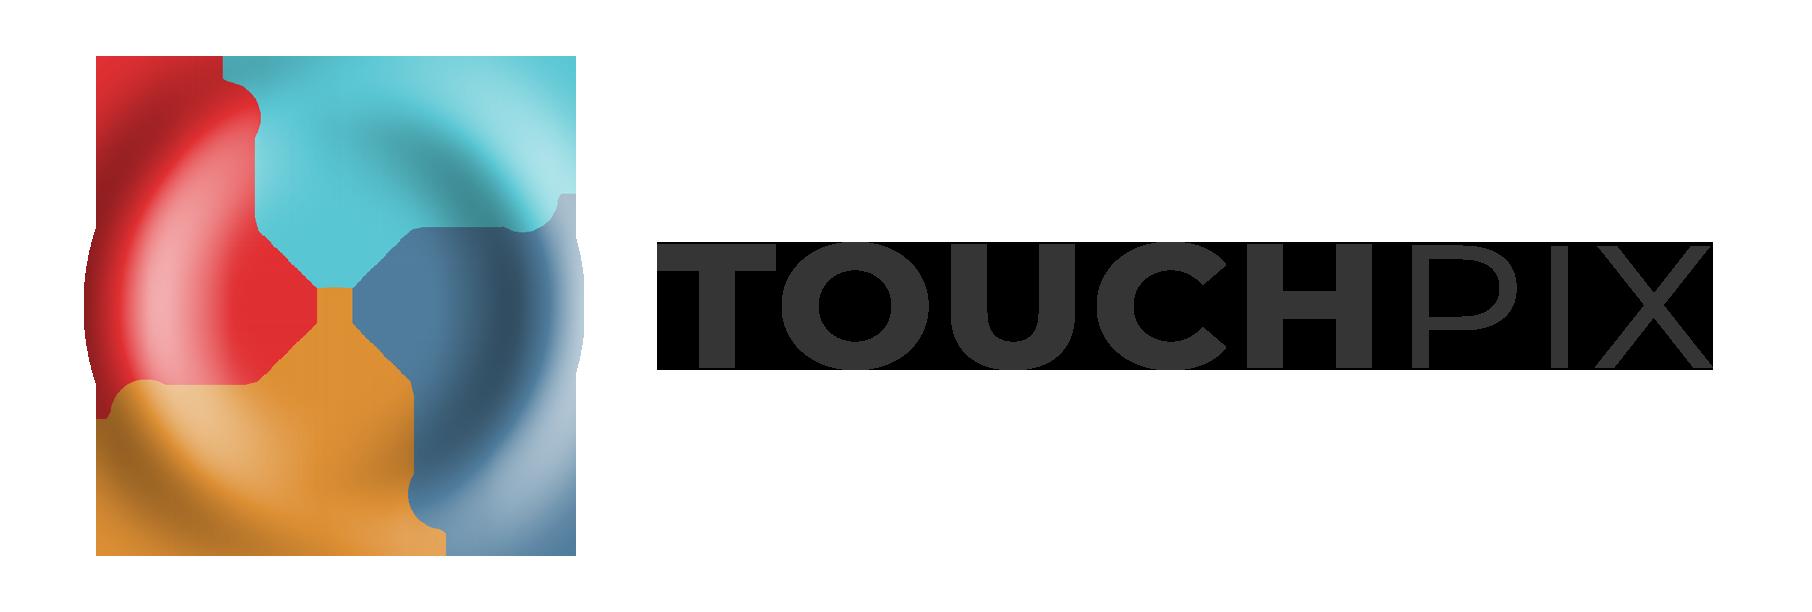 Touchpix